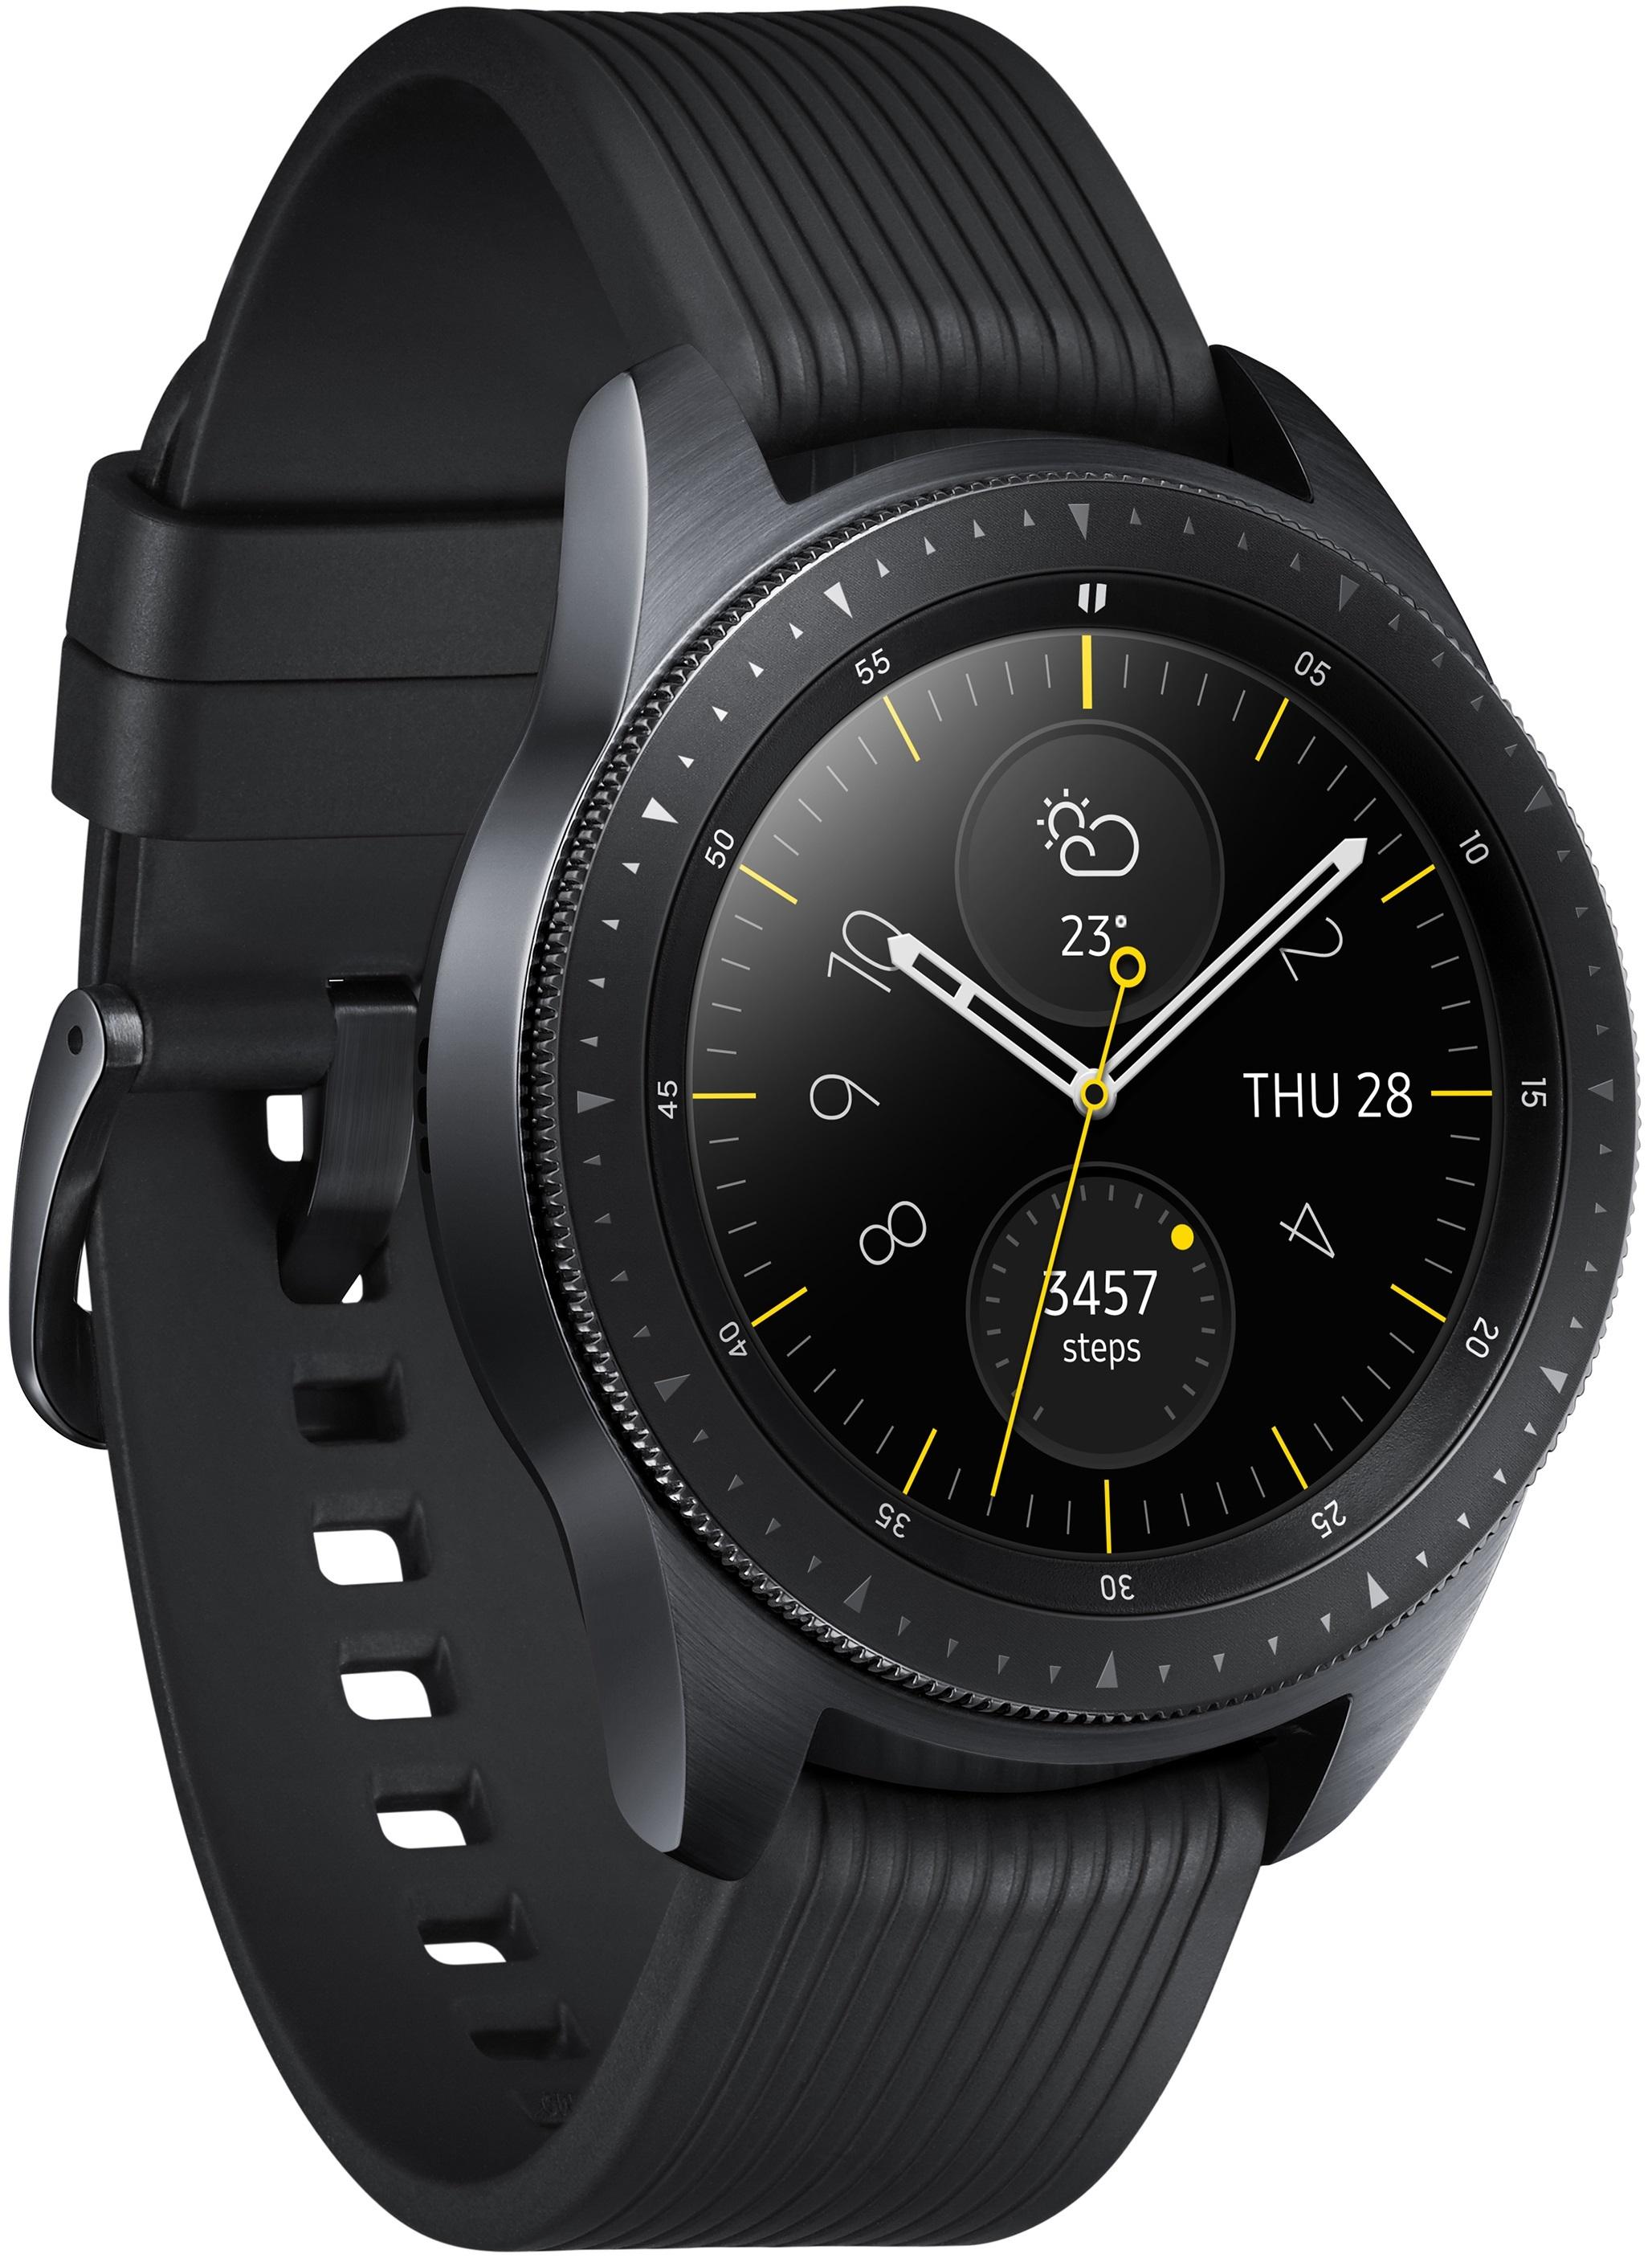 Montre connectée Galaxy Watch 42mm 4G eSim Samsung noir carbone